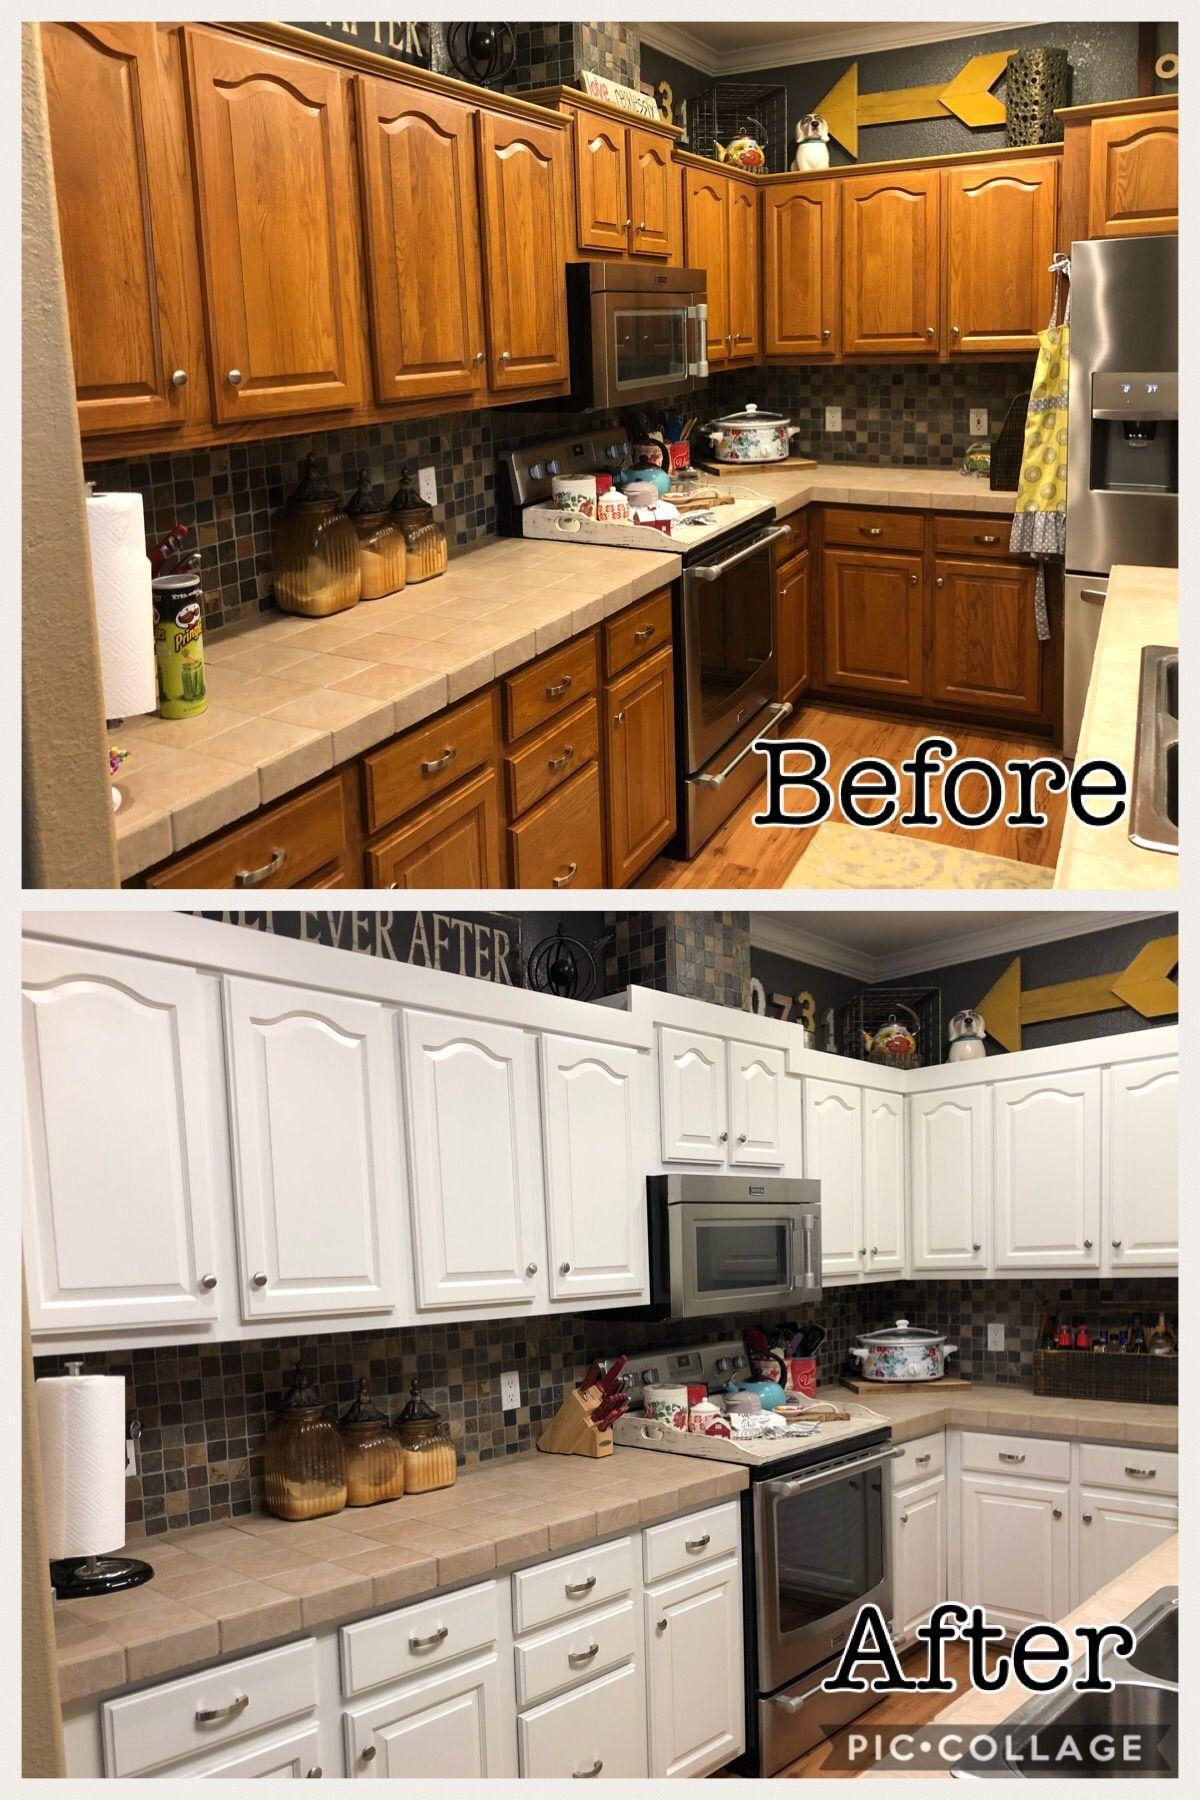 How to paint kitchen (DIY Kitchen Makeover